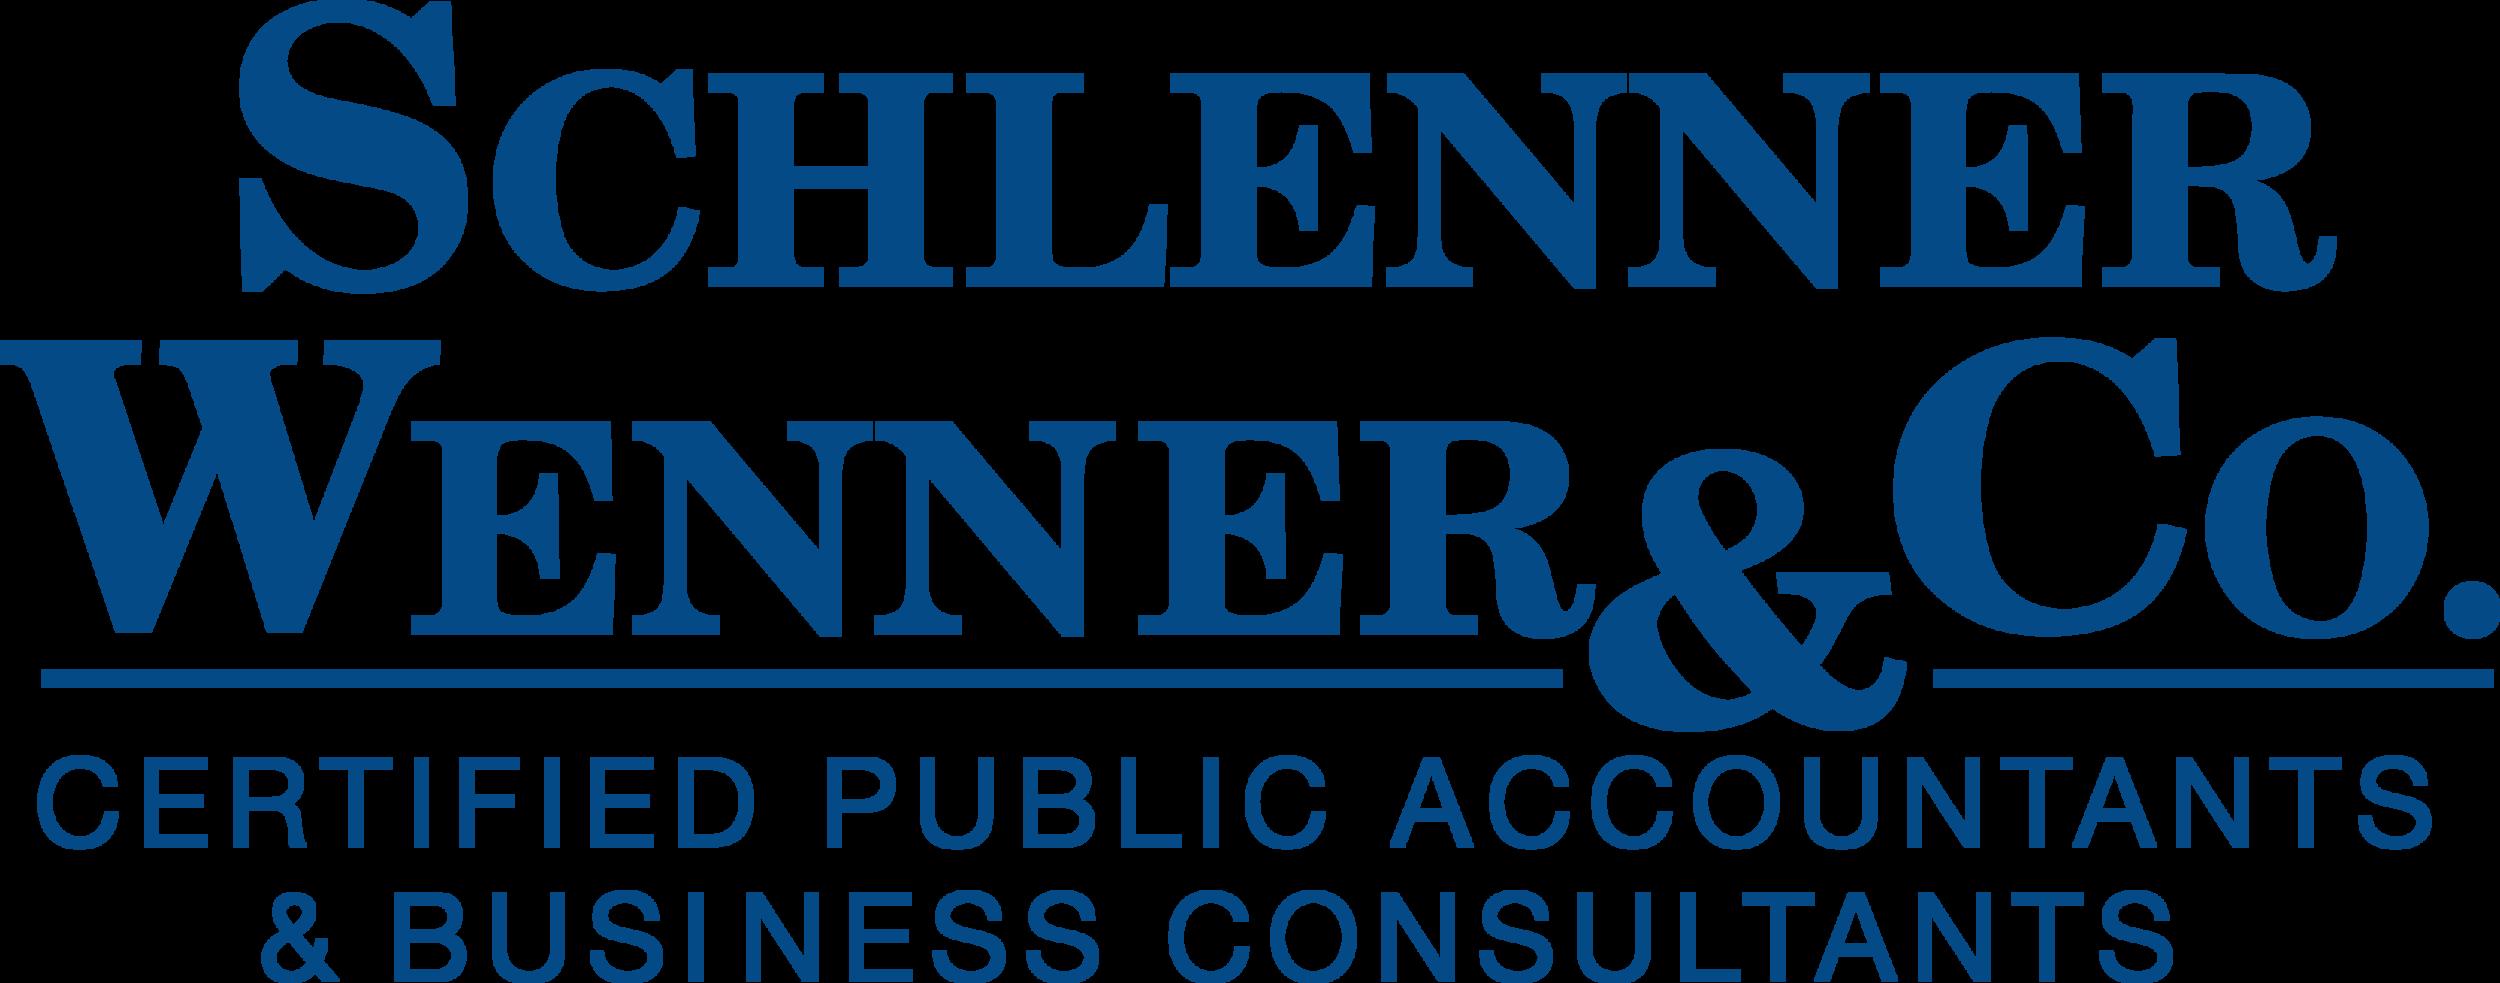 Schlenner Wenner & Co.png